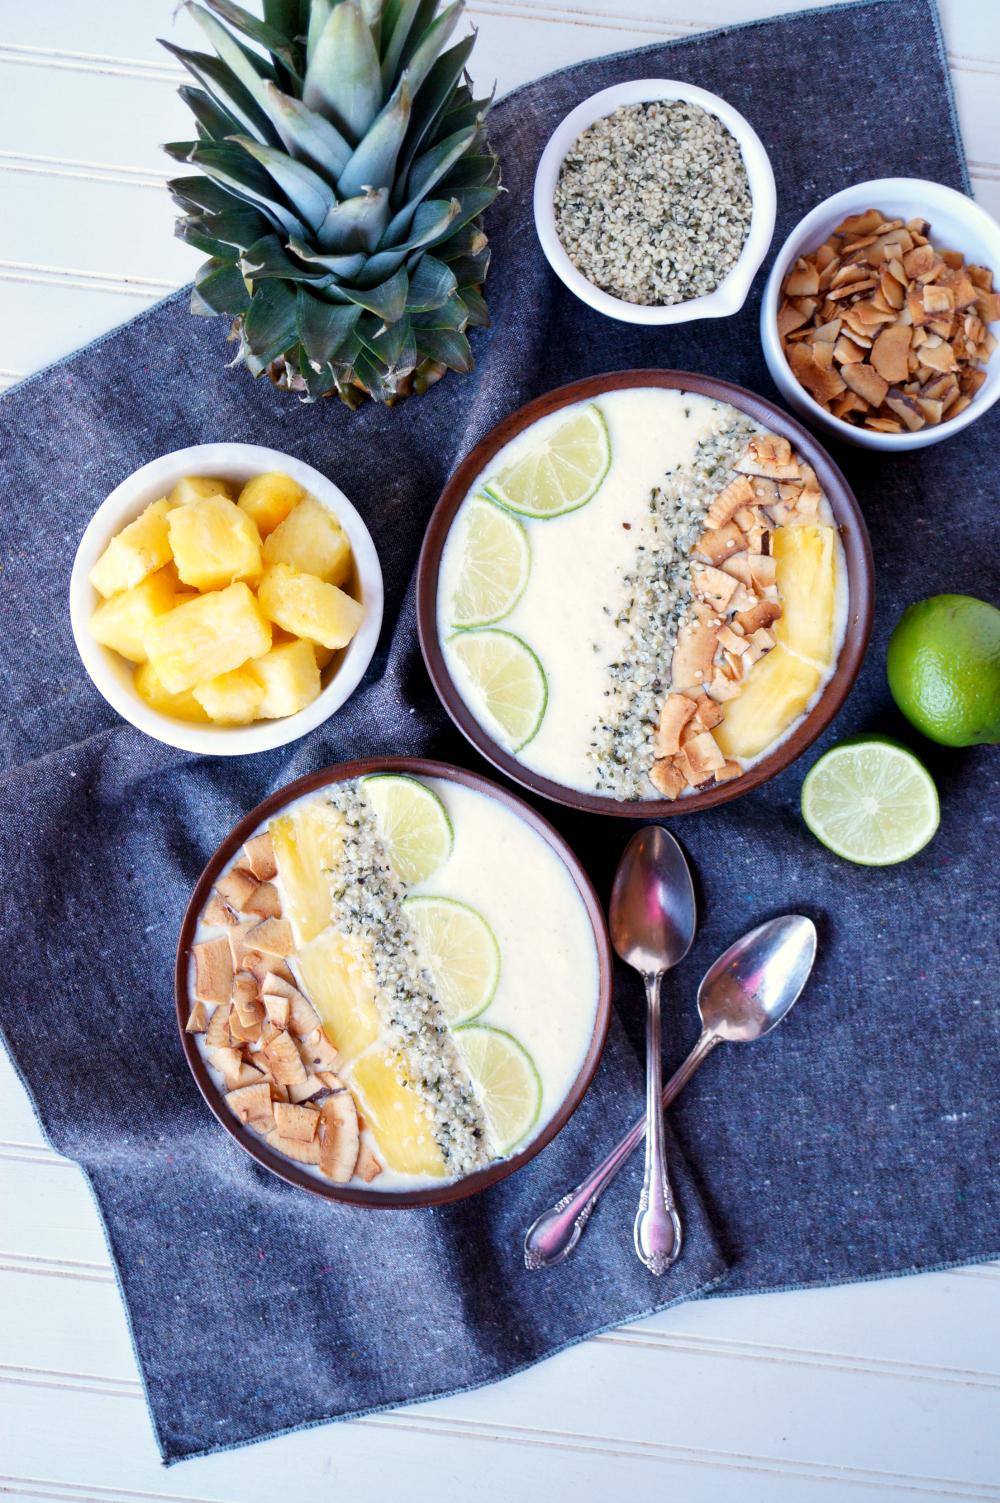 piña colada smoothie bowls